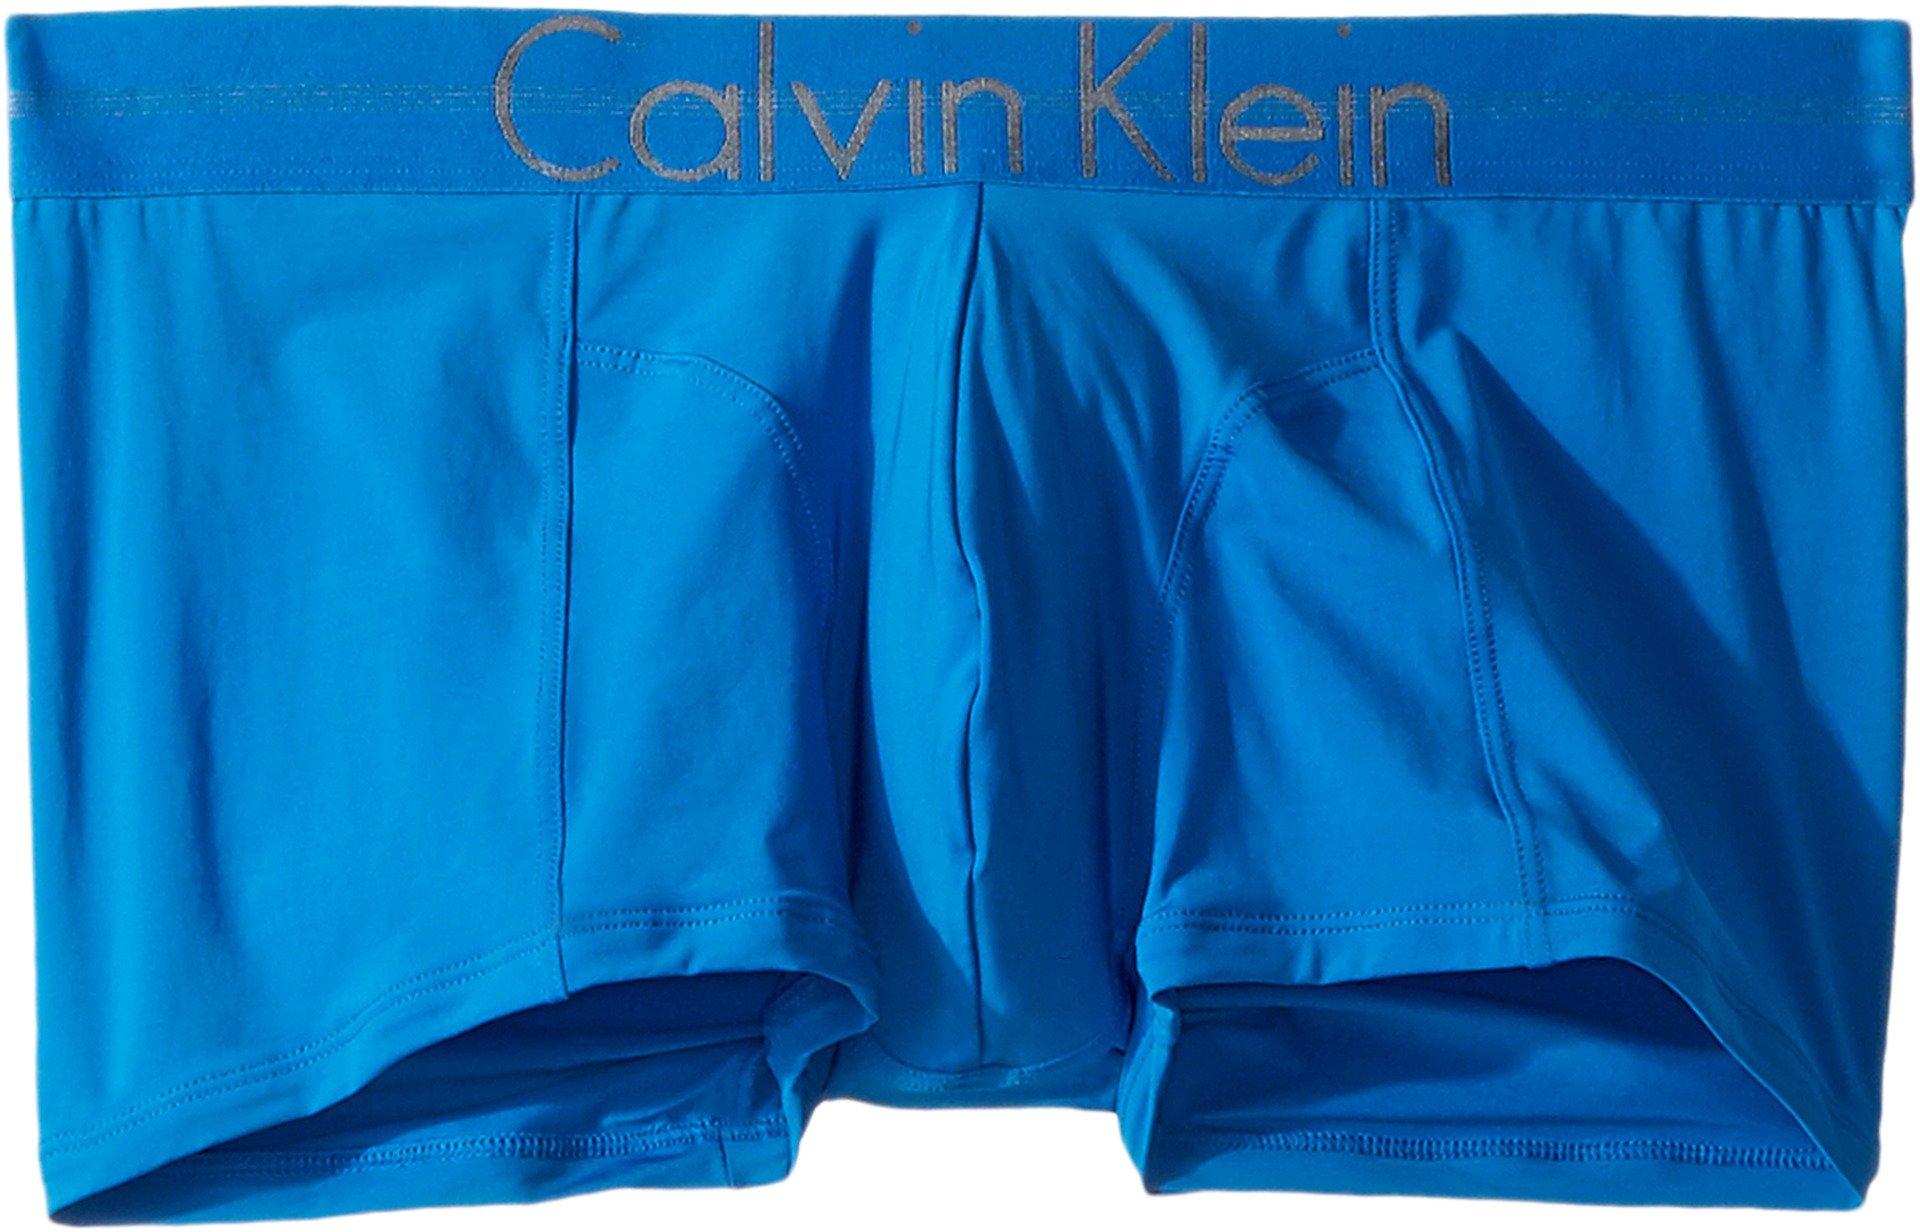 Calvin Klein Men's Underwear Focused Fit Low Rise Trunks, Summer Blue, Medium